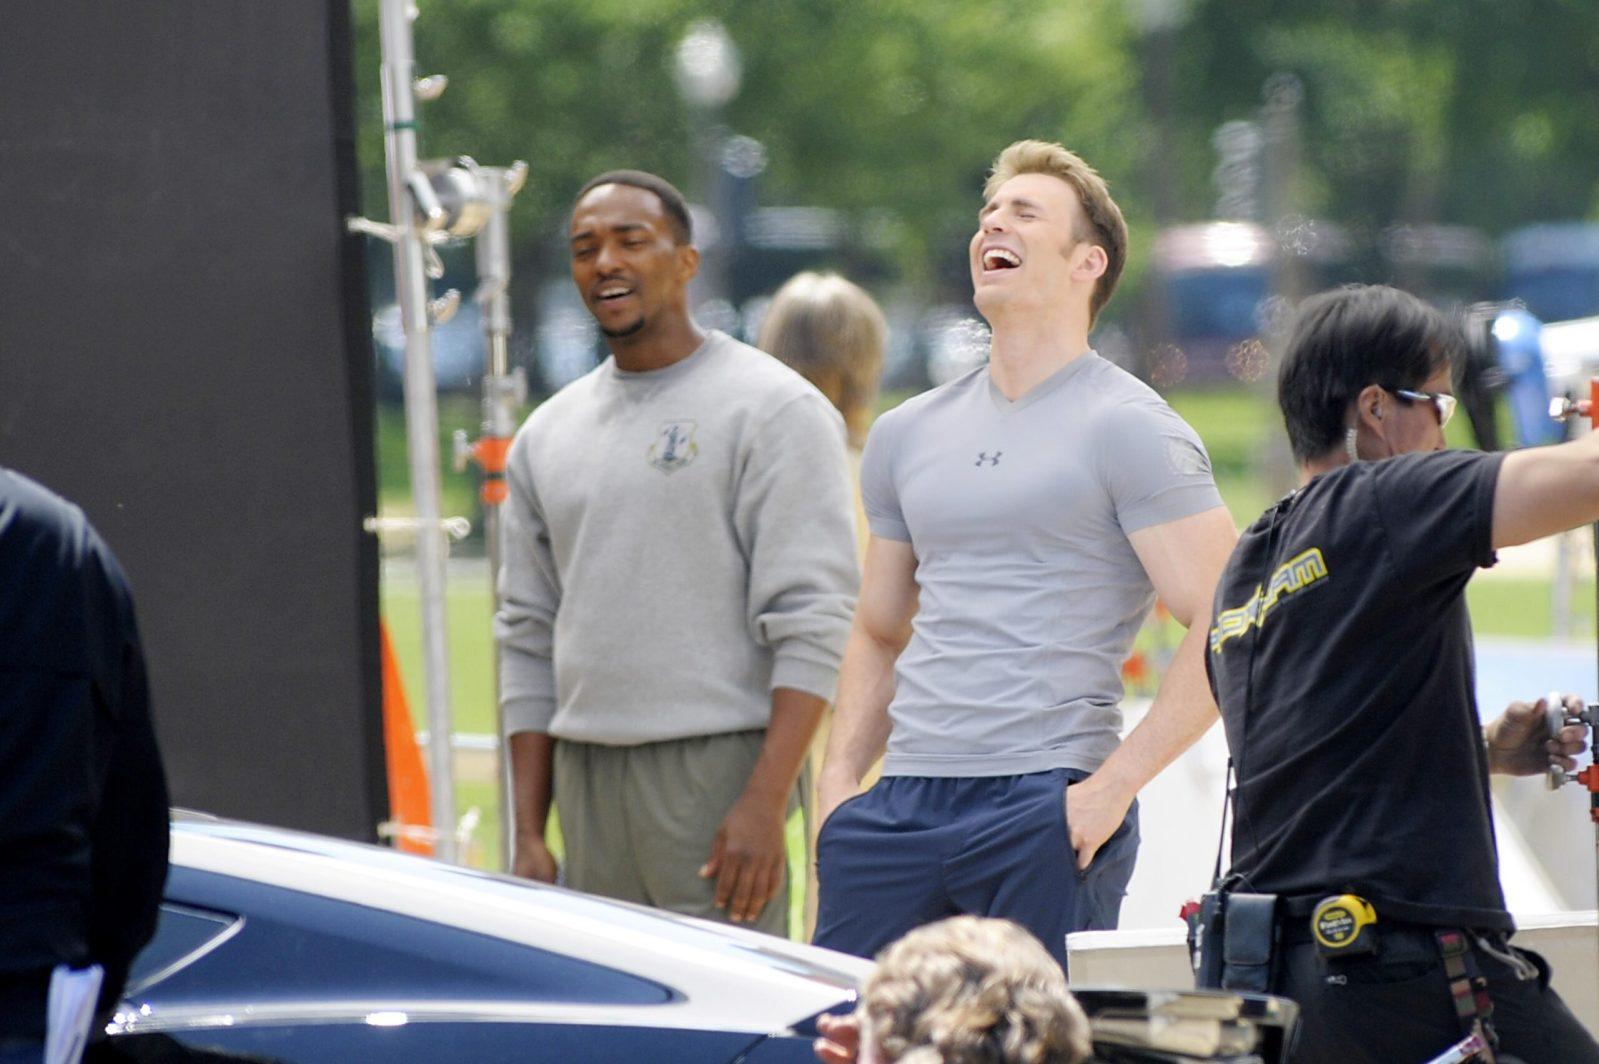 Chris Evans films Captain America